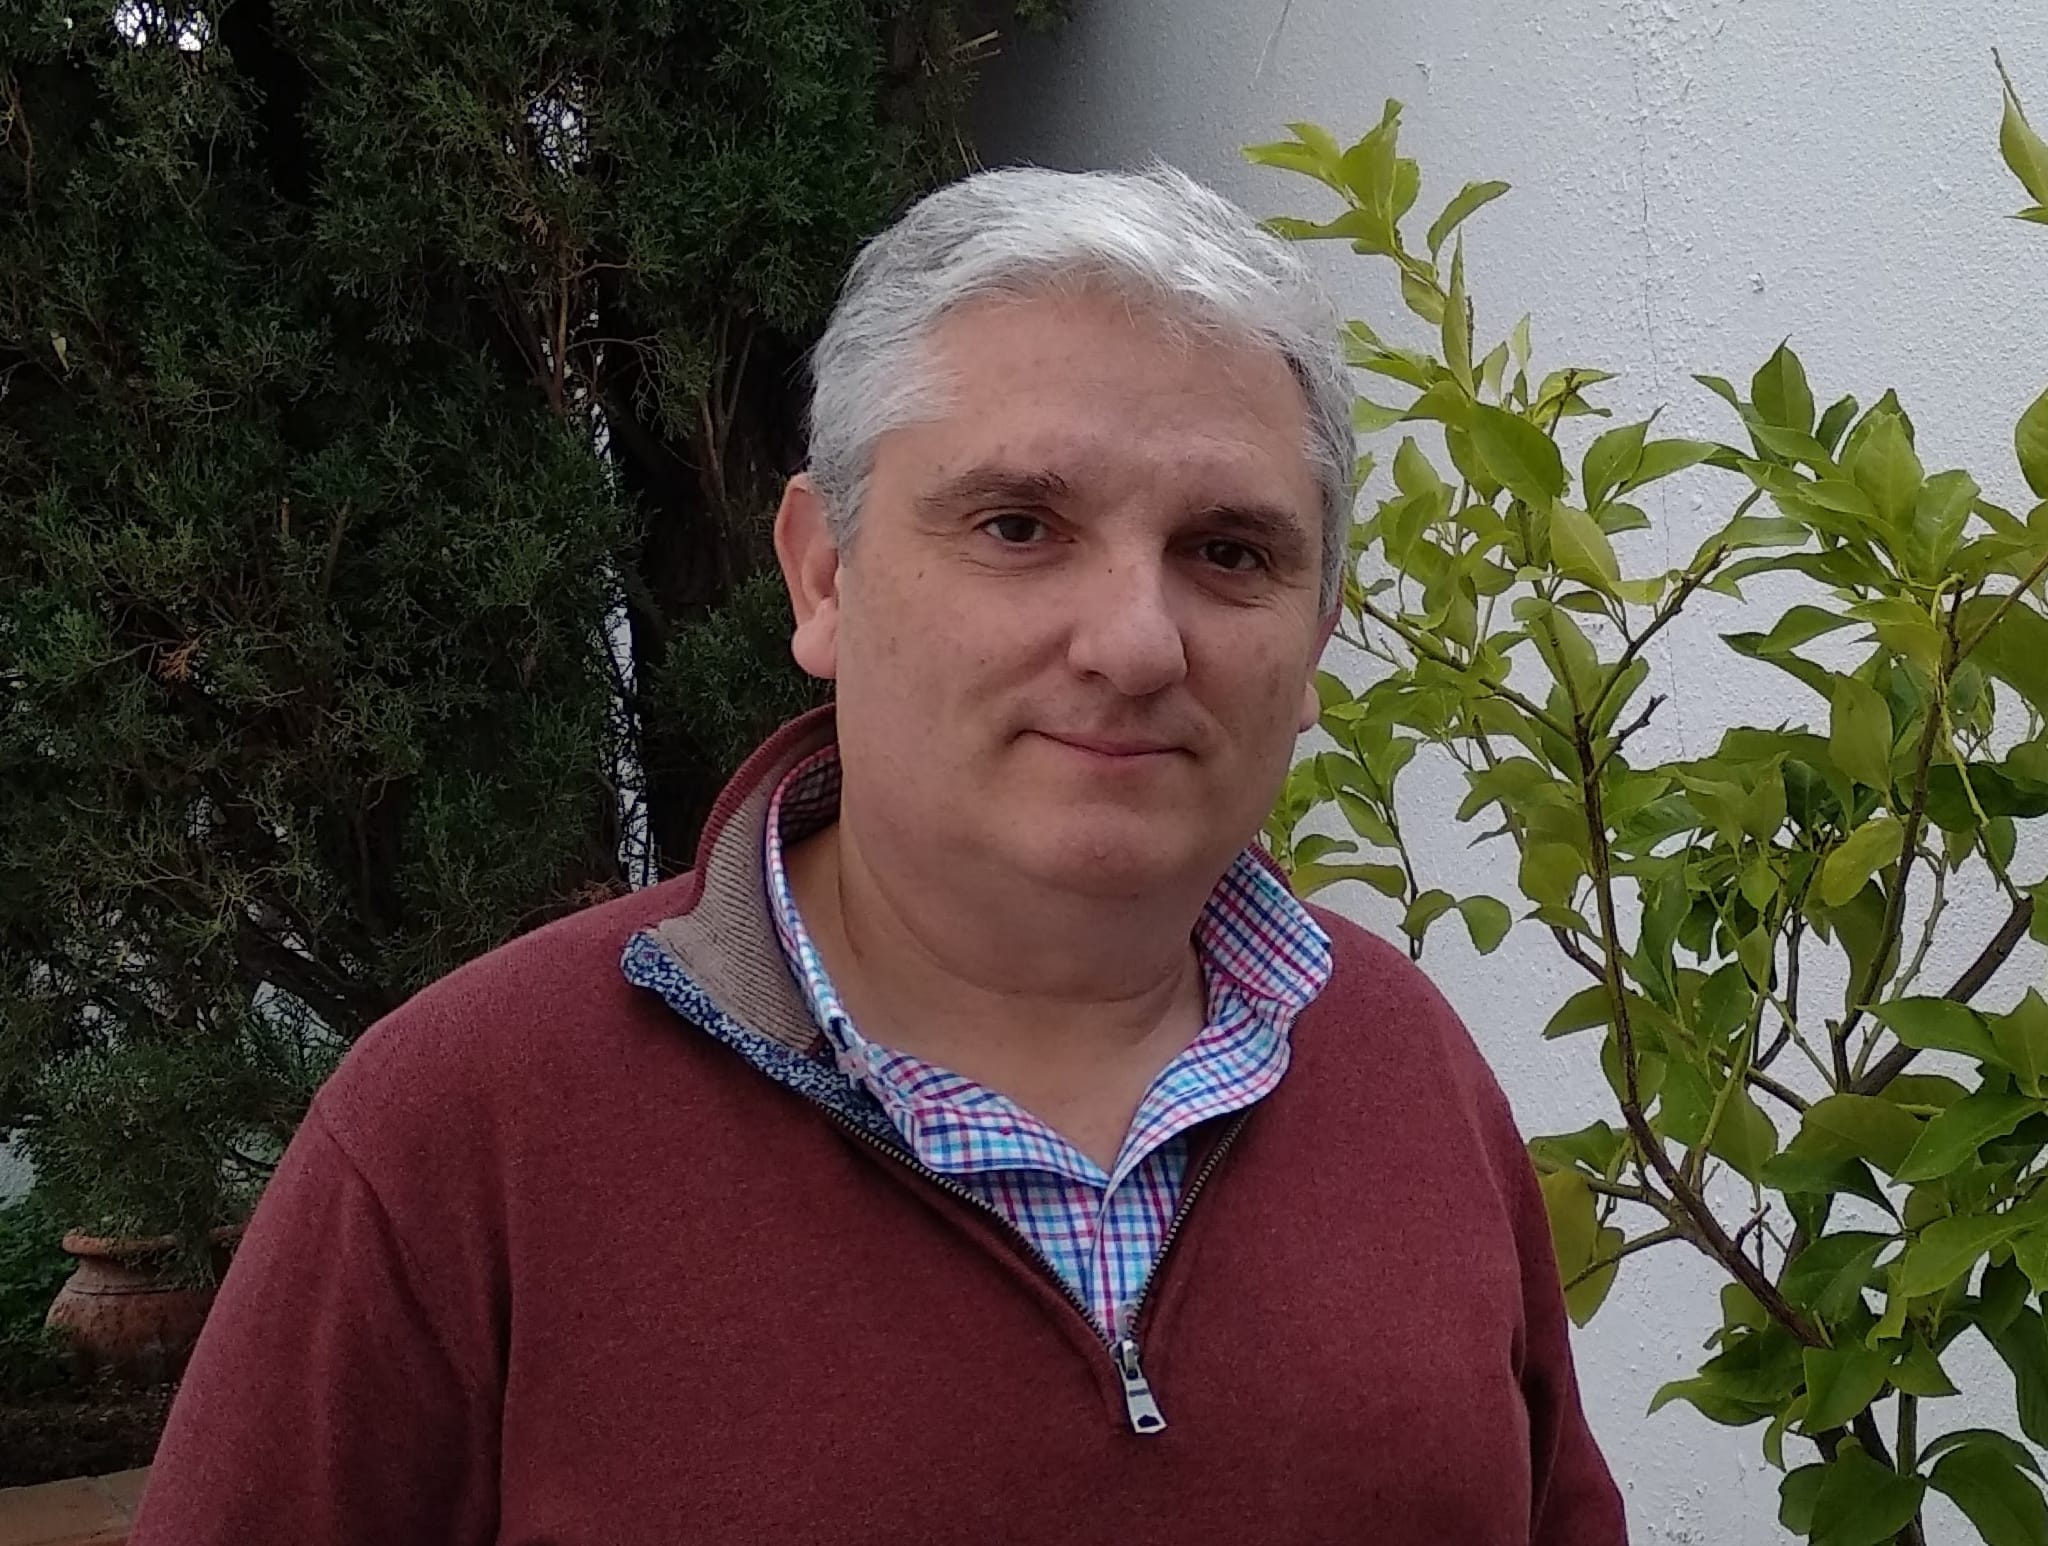 Juan Martín Martín. AGE